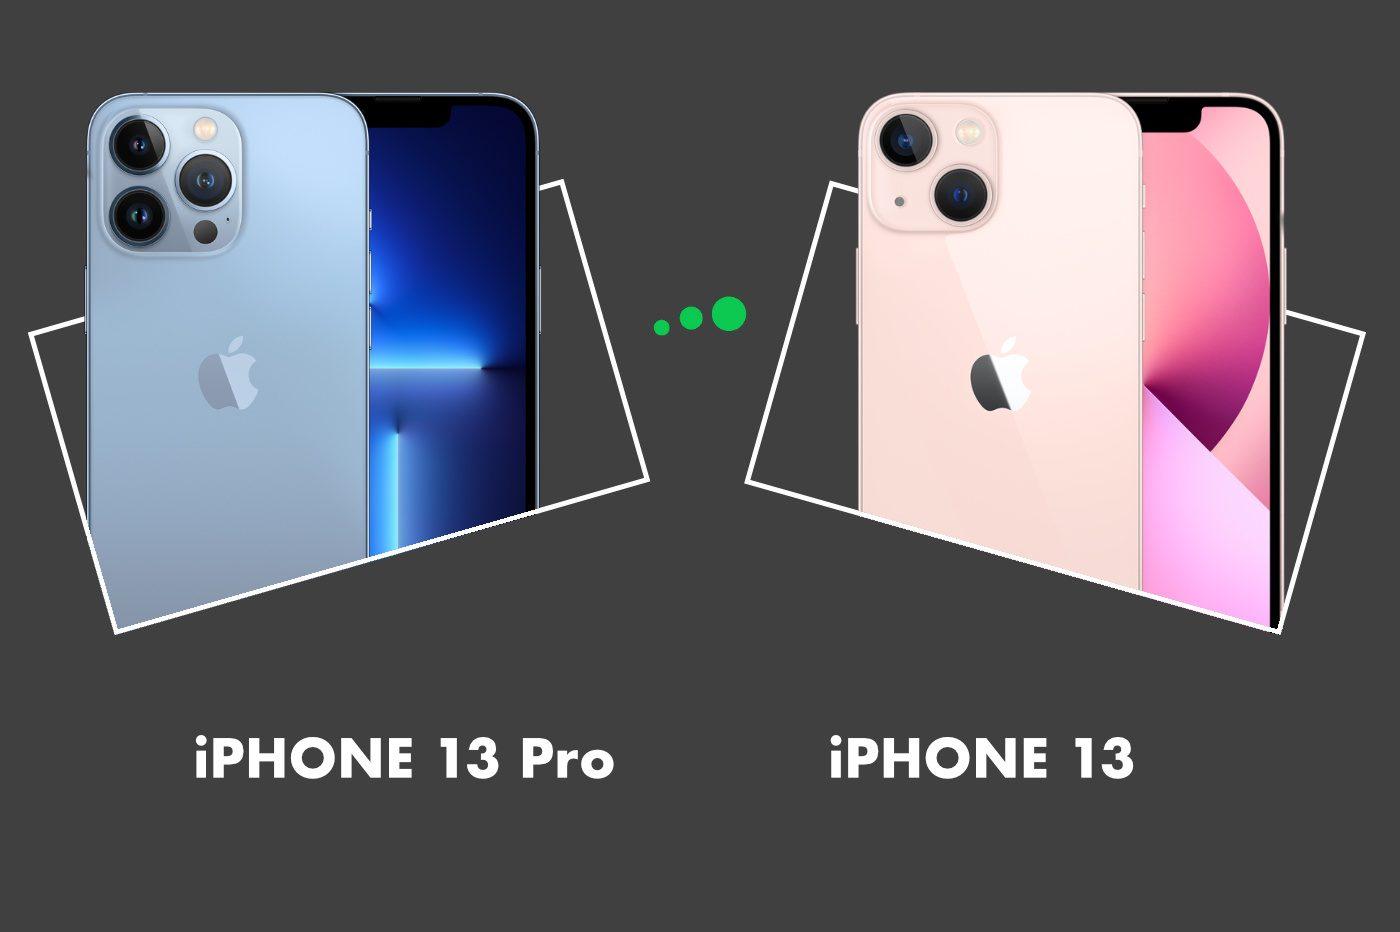 iPhone 13 vs iPhone 13 Pro